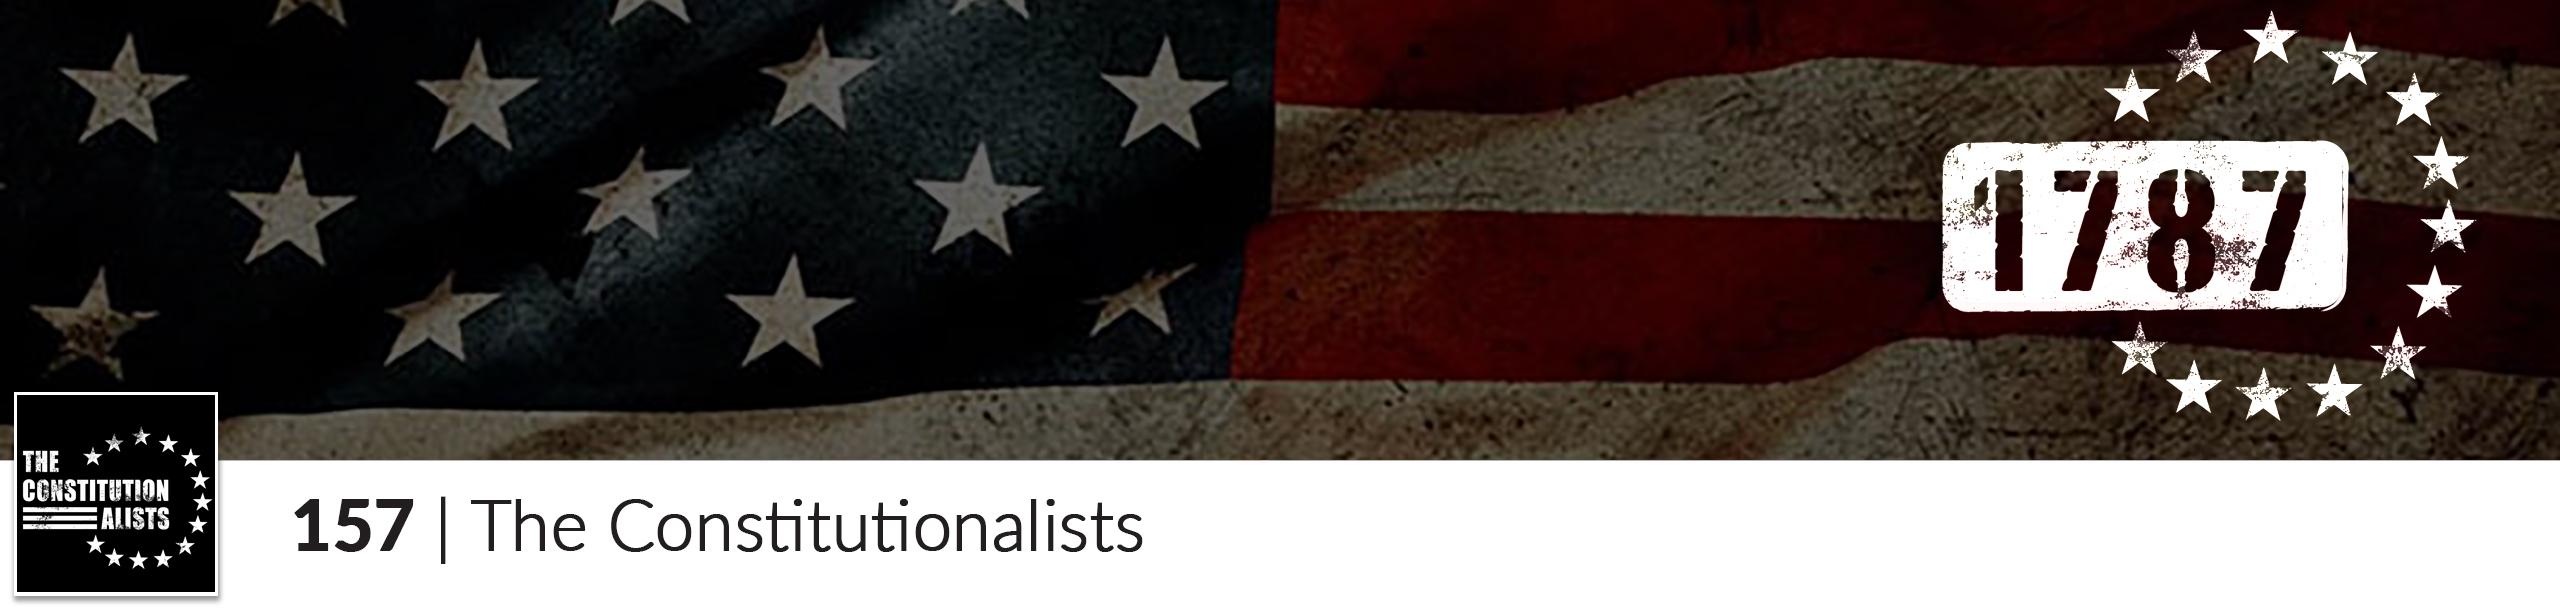 TheConstitutionalists-header1